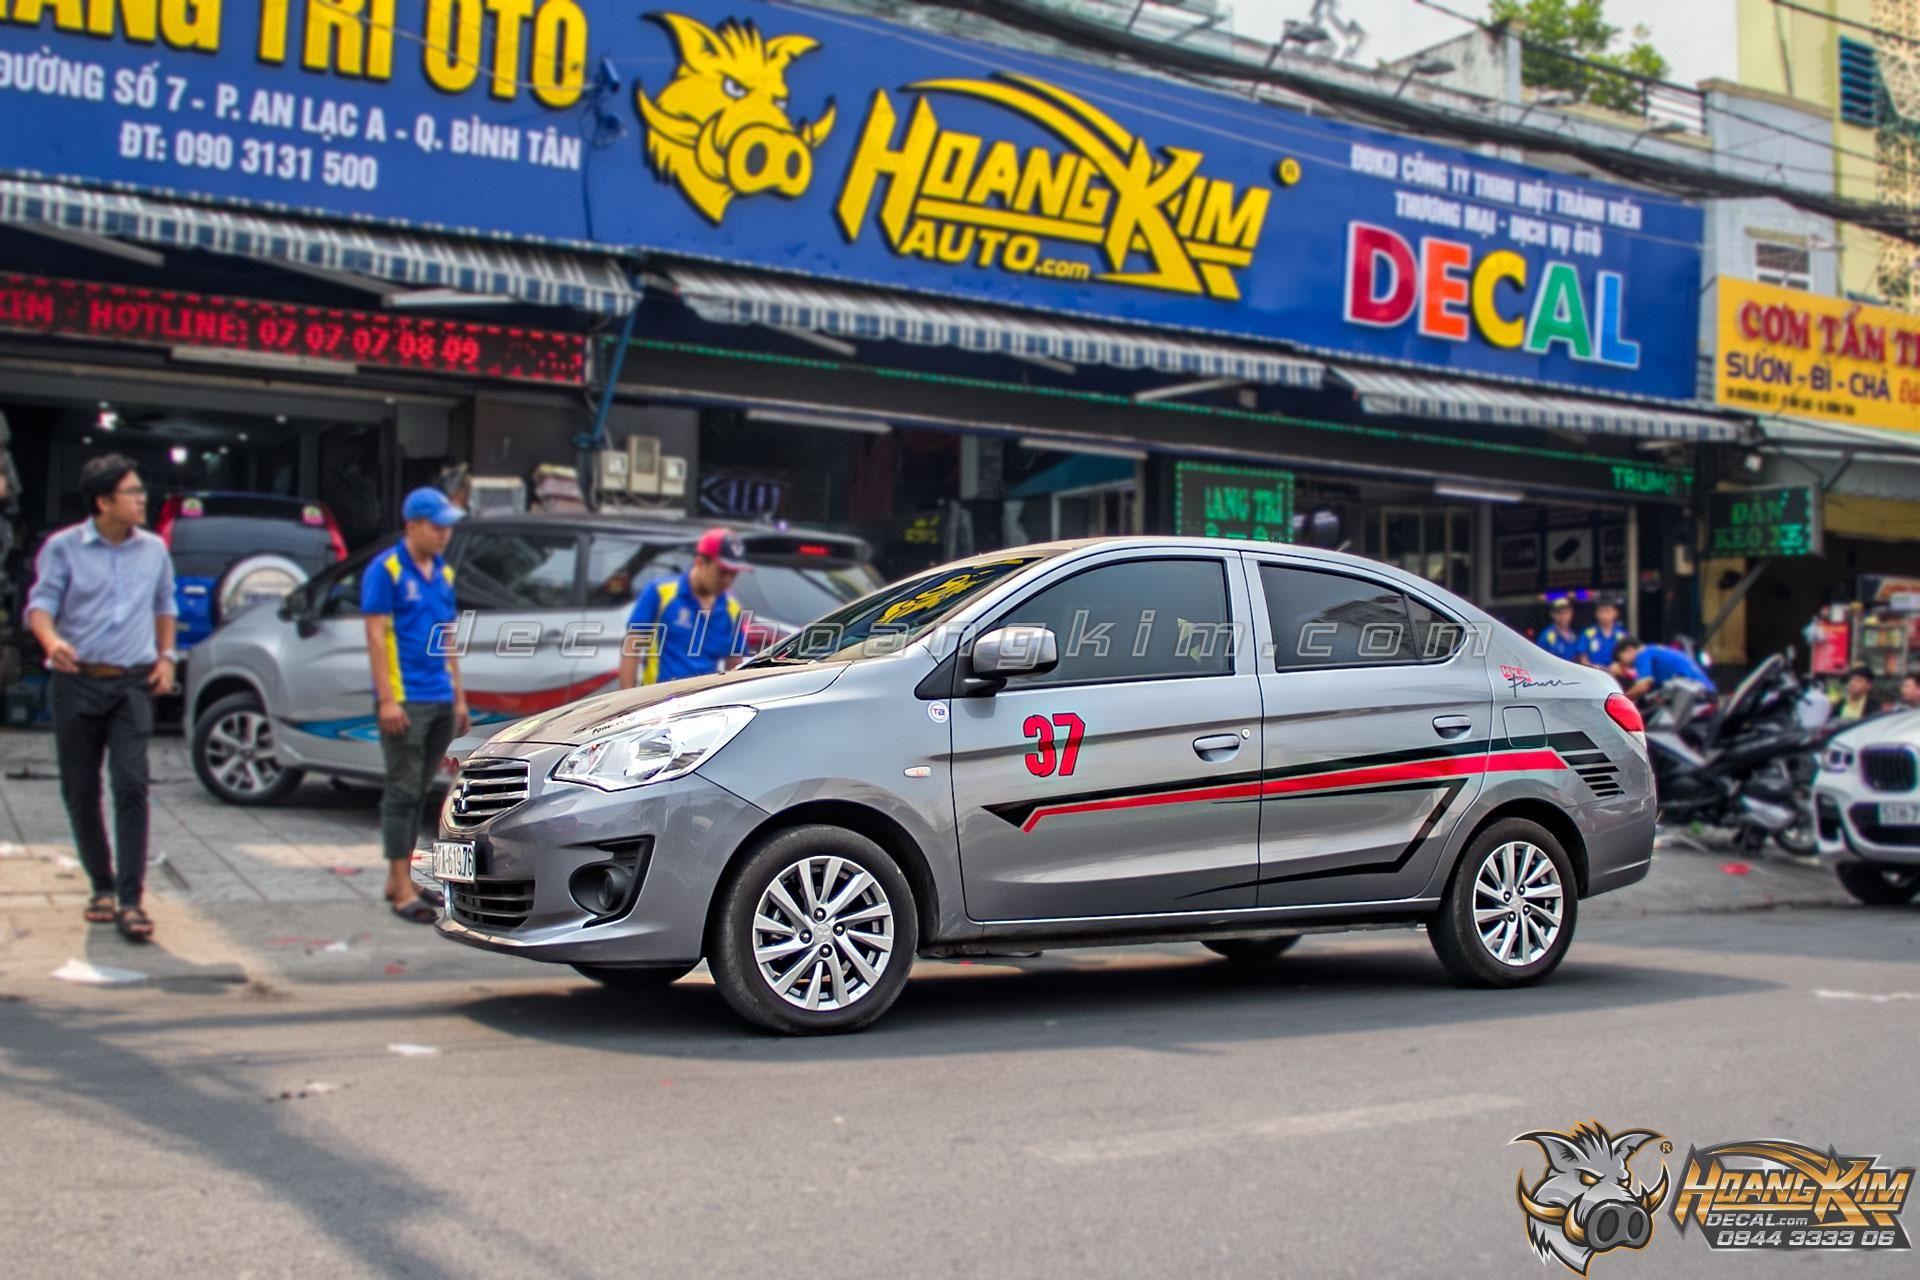 đanh Gia Mitsubishi Attrage 2020 Co Nen Them Tem Xe Mitsubishi Attrage Trong 2020 Xe Cộ Xe đẹp Honda